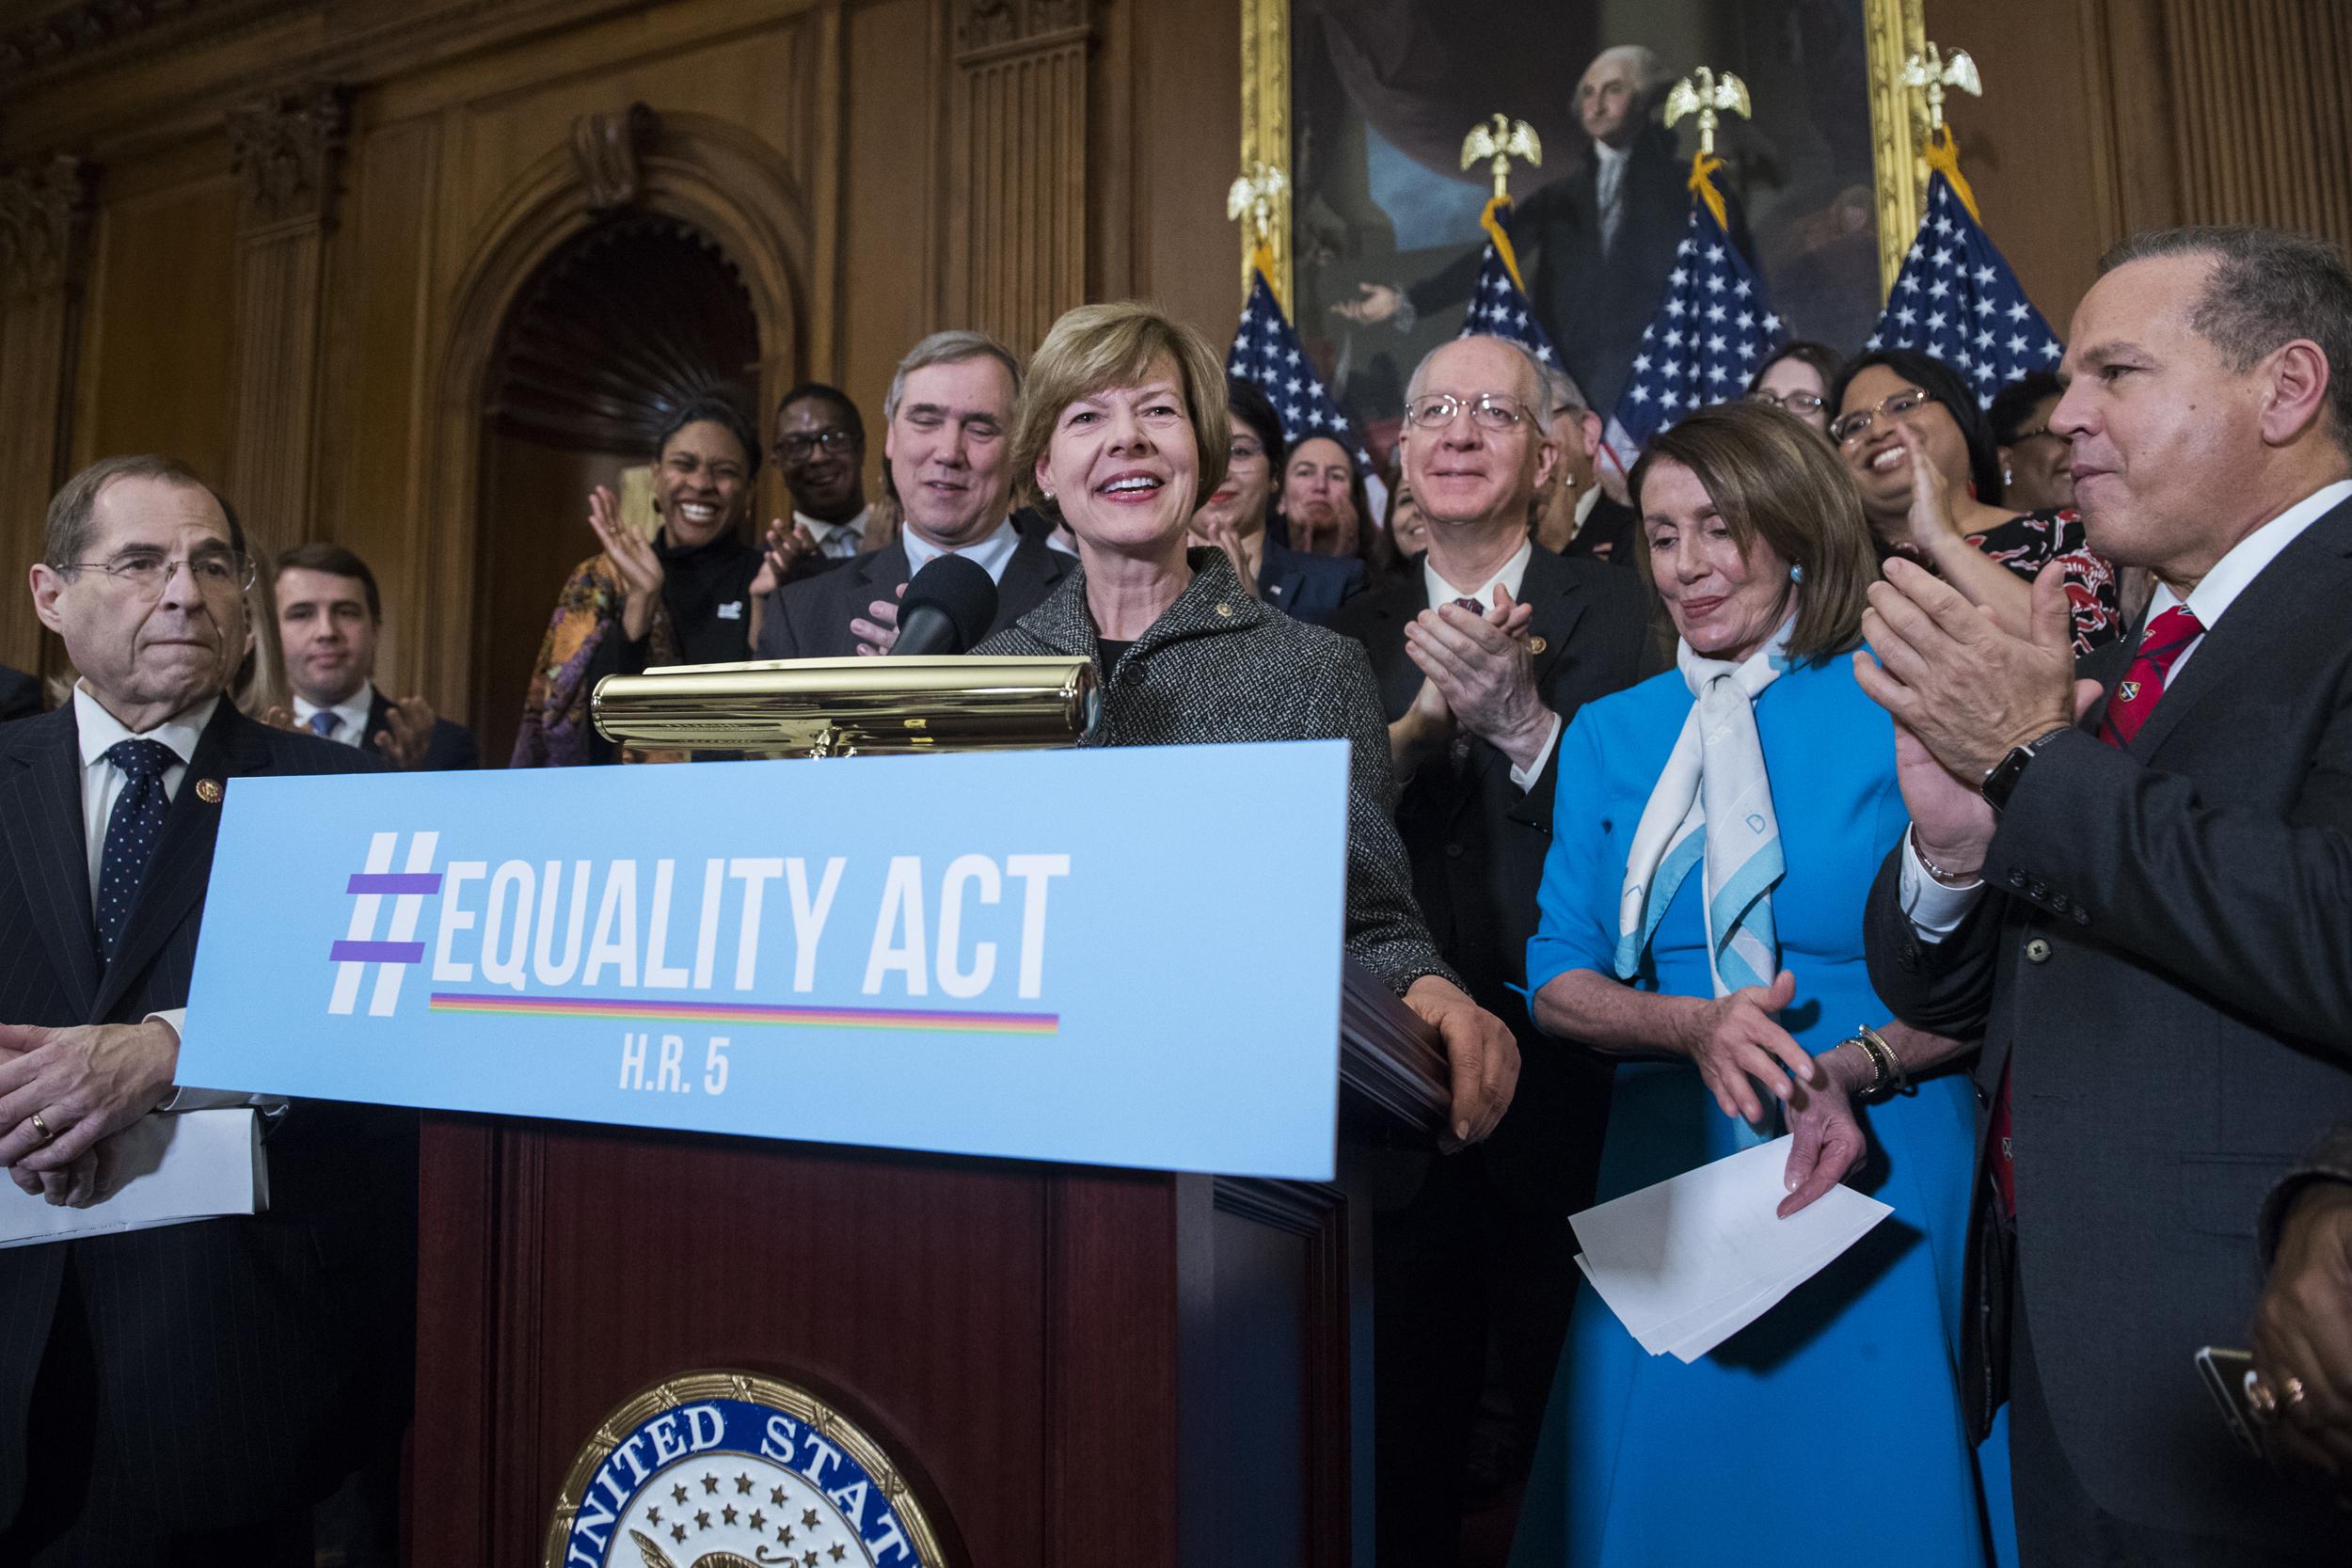 Democrats reintroduce Equality Act to ban LGBTQ discrimination